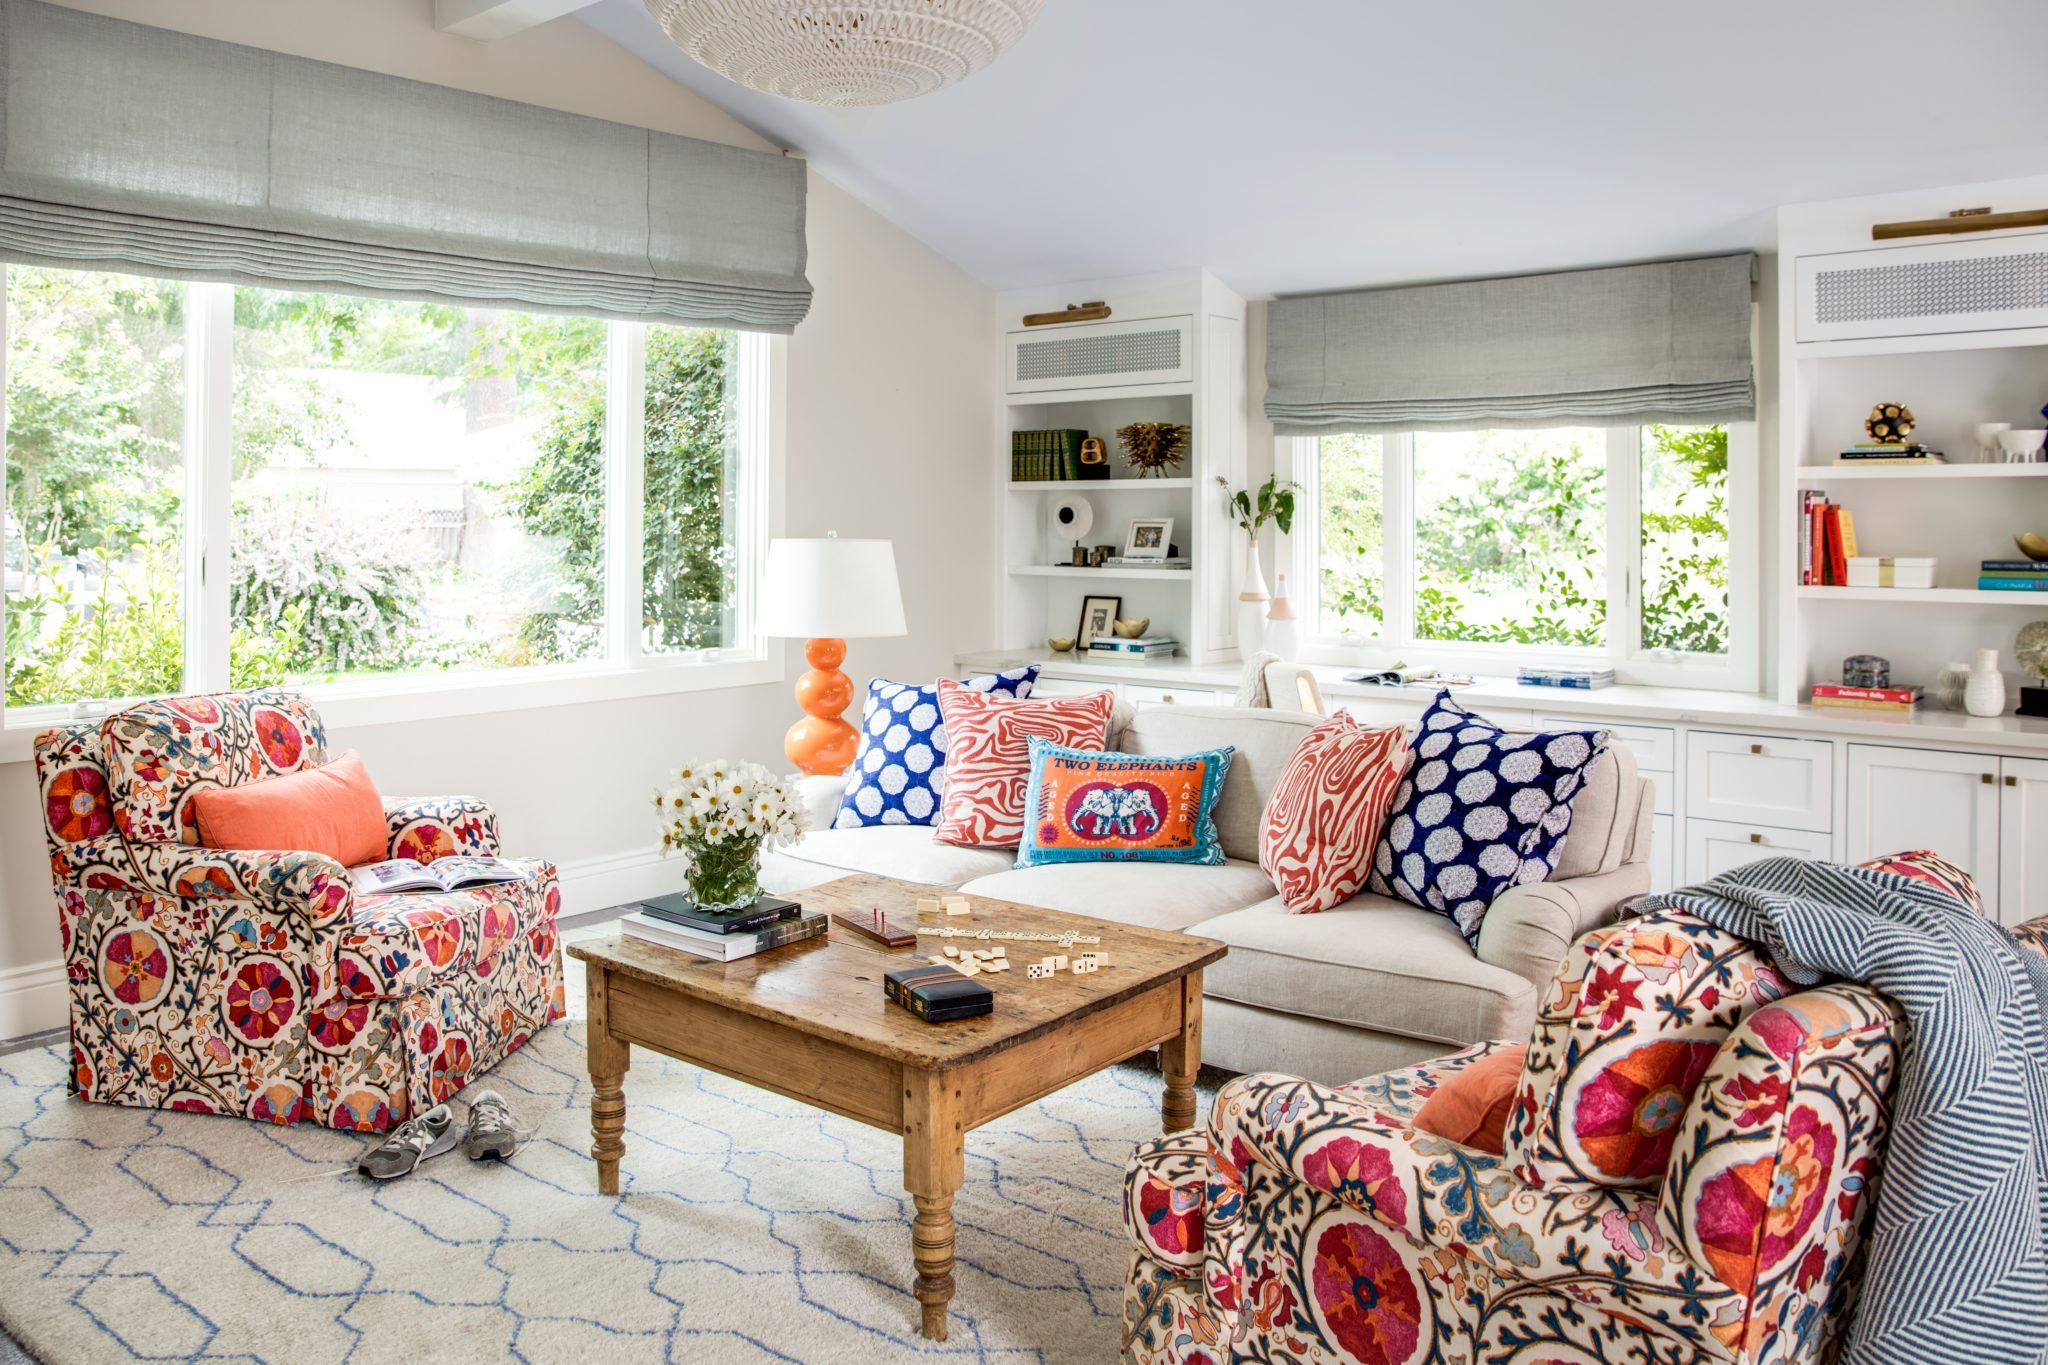 Alamo - Family Room by Nest Design Company